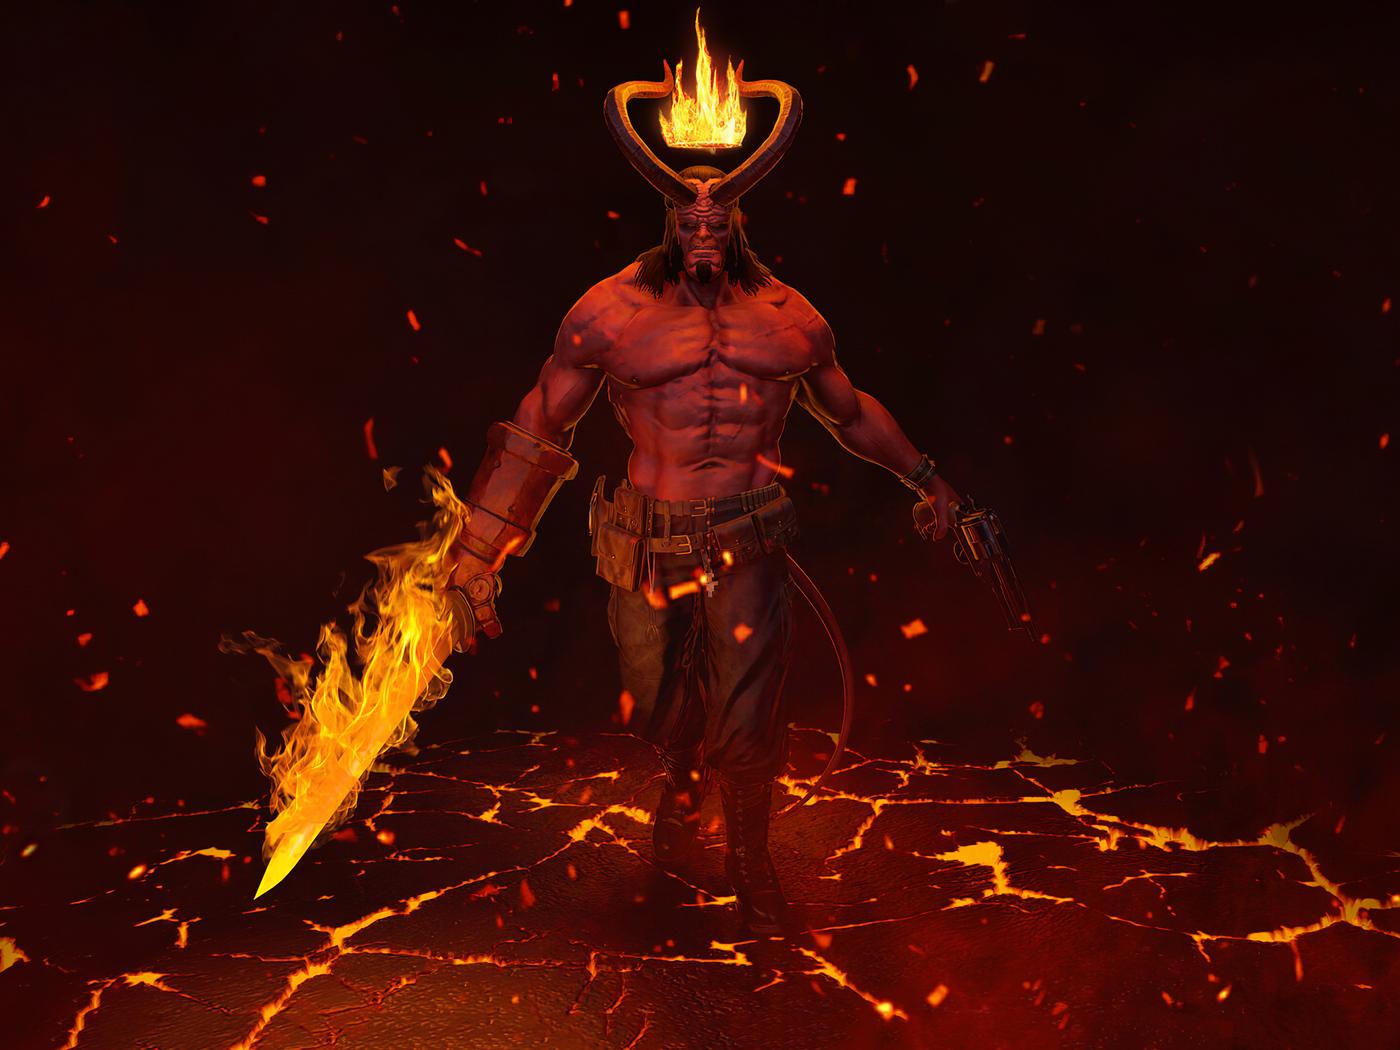 hellboy-4k-2020-gj.jpg